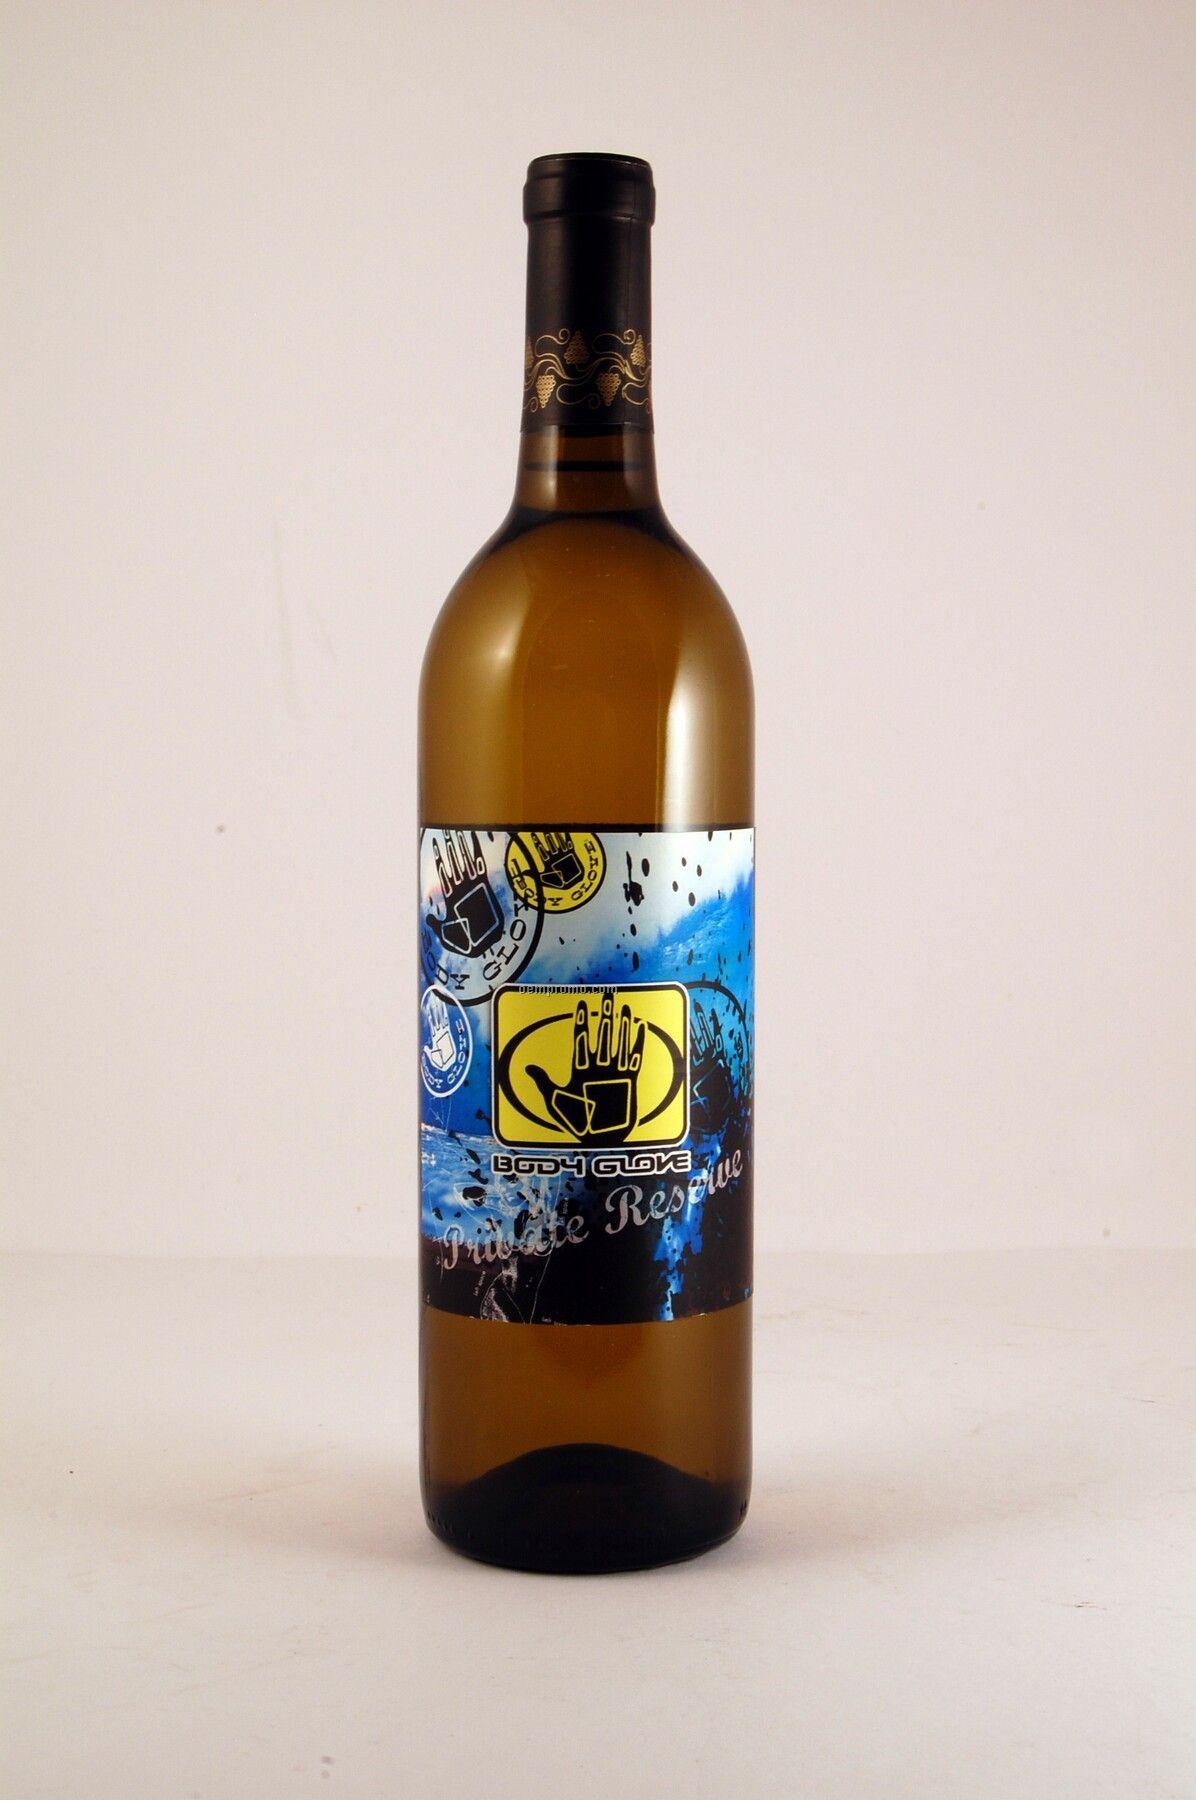 2009 Wv Gewurztraminer California Wine (Custom Labeled Wine)